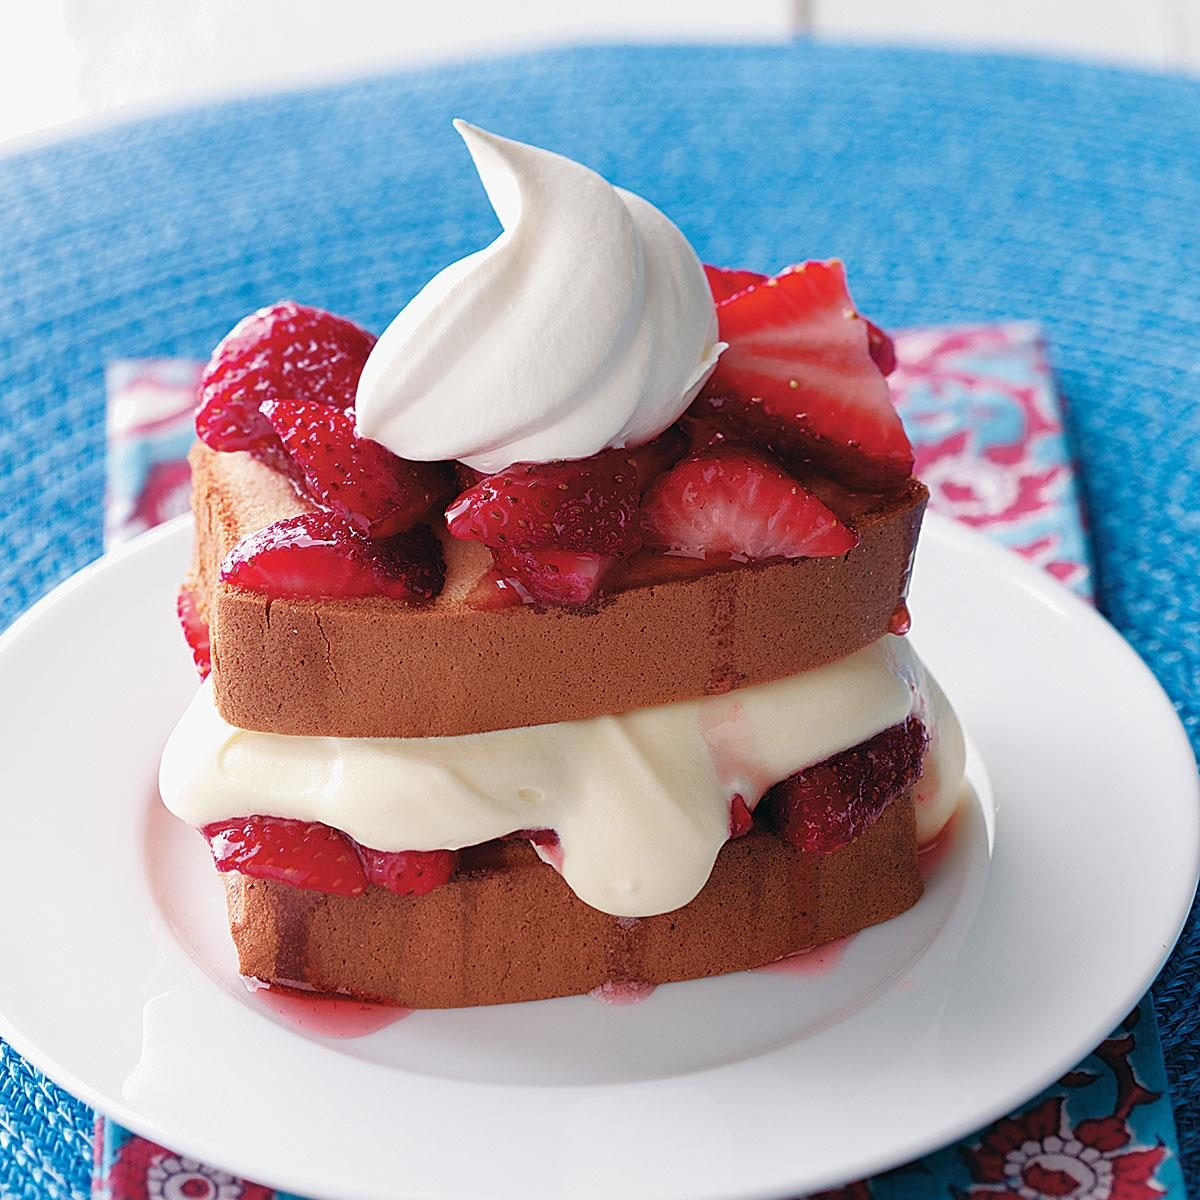 Shortcut Strawberry-Vanilla Dessert Recipe